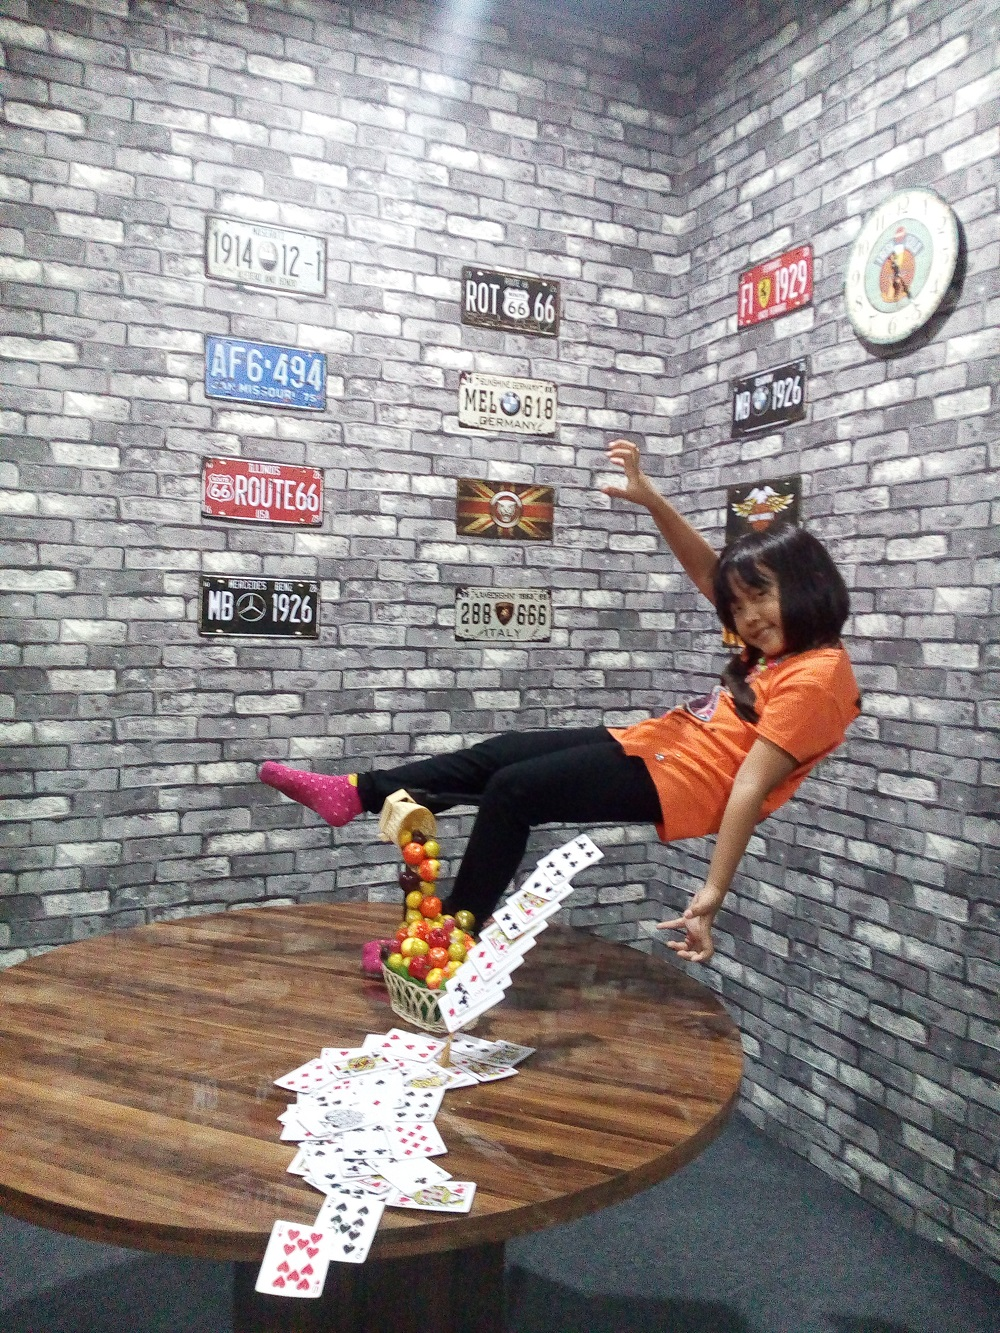 World Magic Jogja Harga Tiket Masuk Info Lengkap Lokasi Yogyakarta